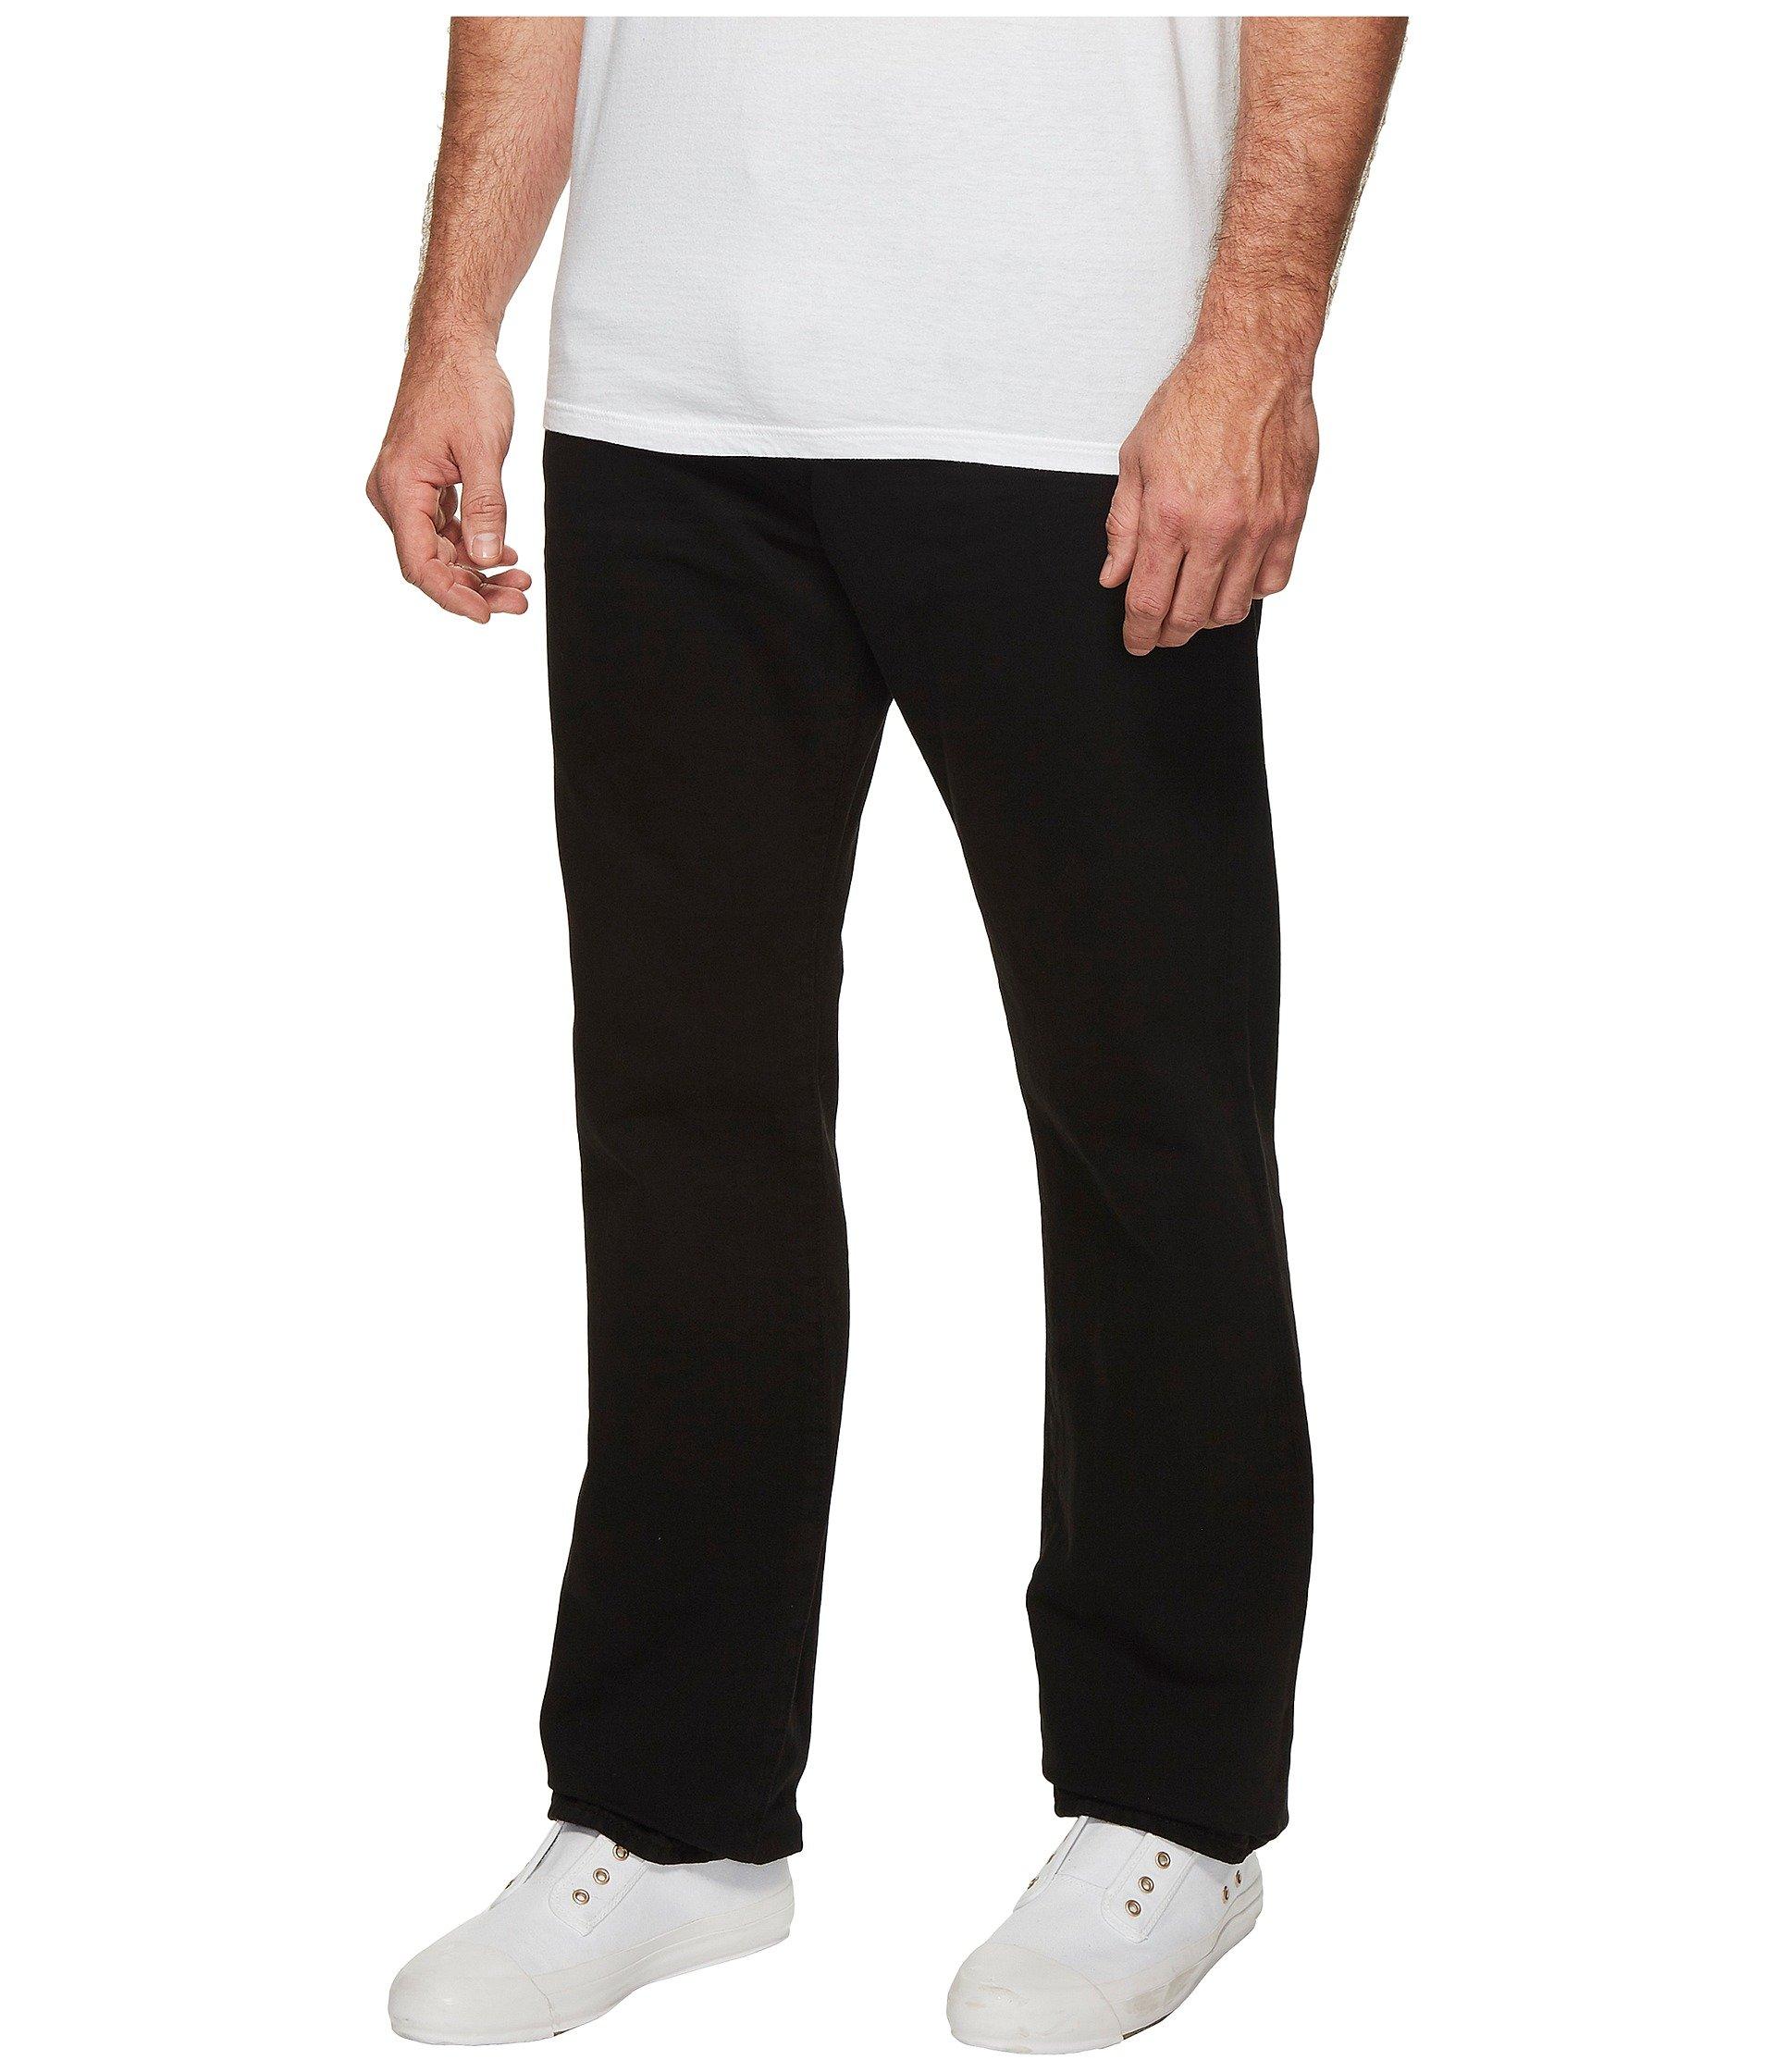 Polo Black Fit Lauren Jeans amp; Straight Tall Hampton Ralph Big Hudson rrw6qvfp